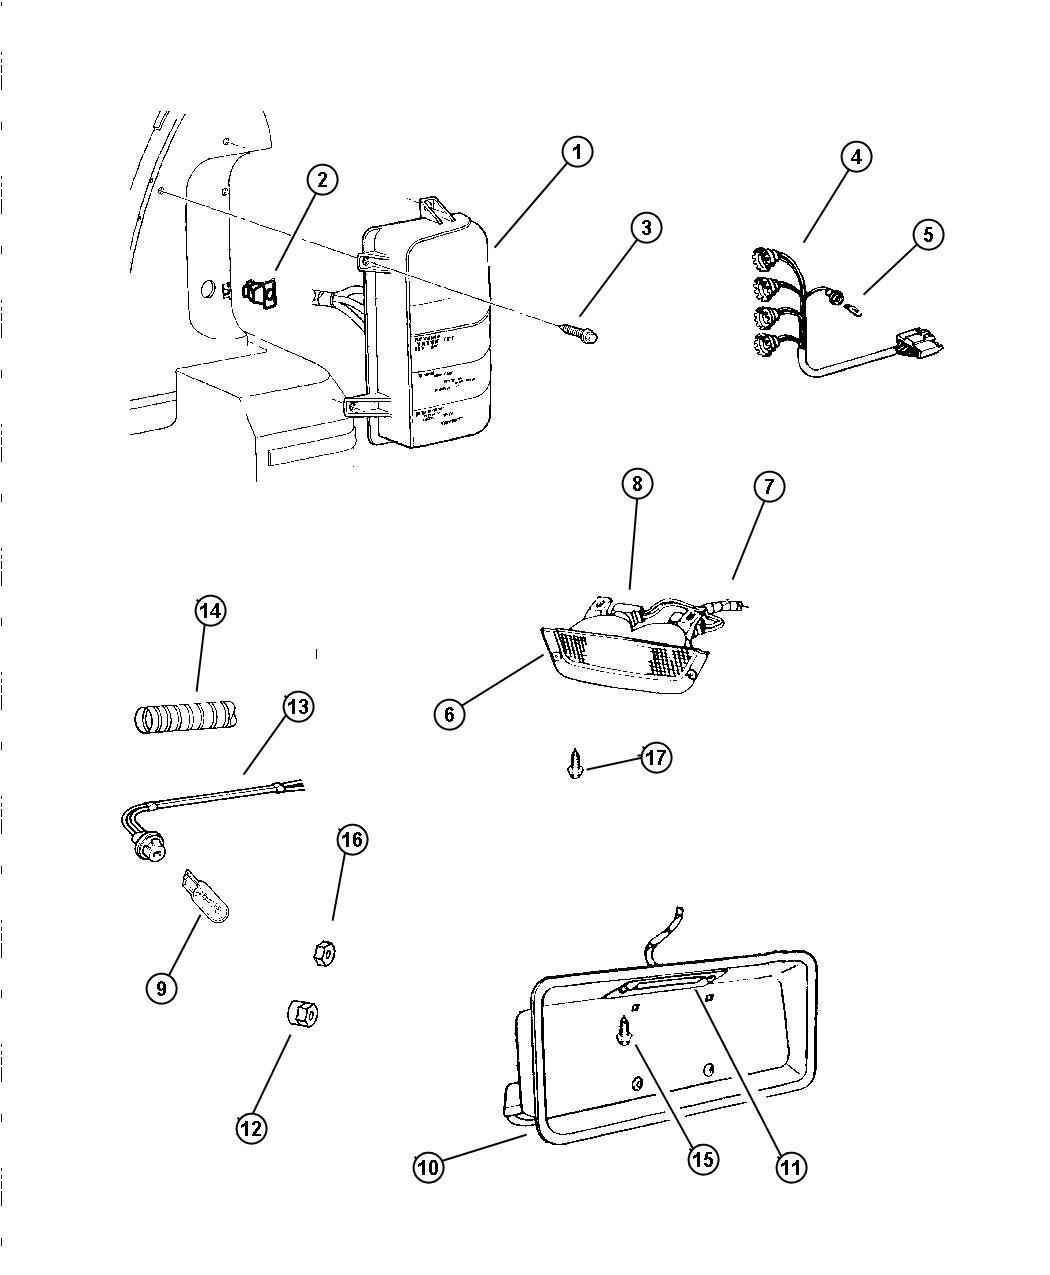 1998 Dodge Dakota Wiring  Tail Lamp  With Sockets  Rear  Body  Door